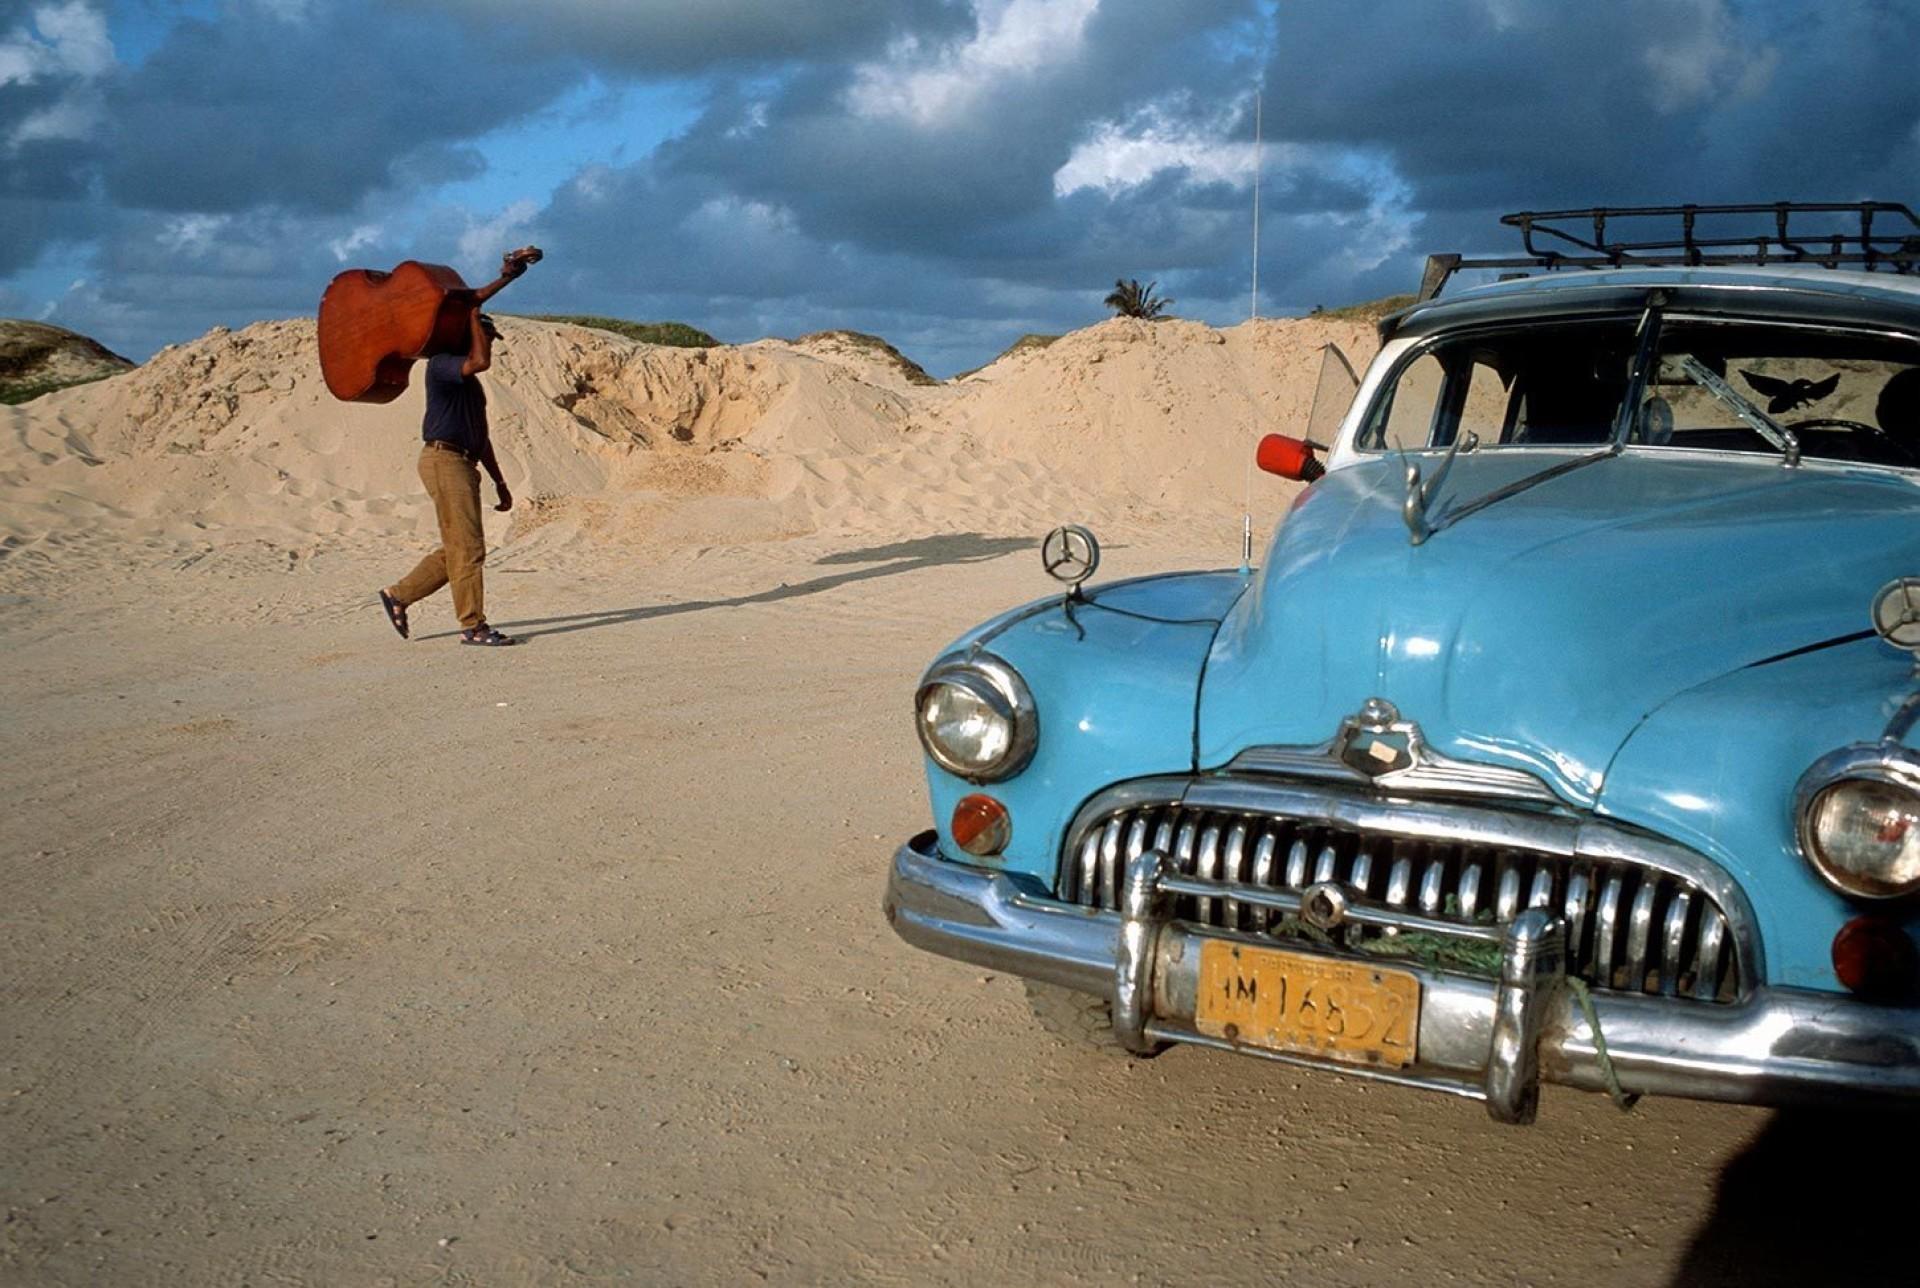 По пляжу бродит музыкант. Санта-Мария-дель-Мар, Гавана, Куба, 1998. @ Дэвид Алан Харви